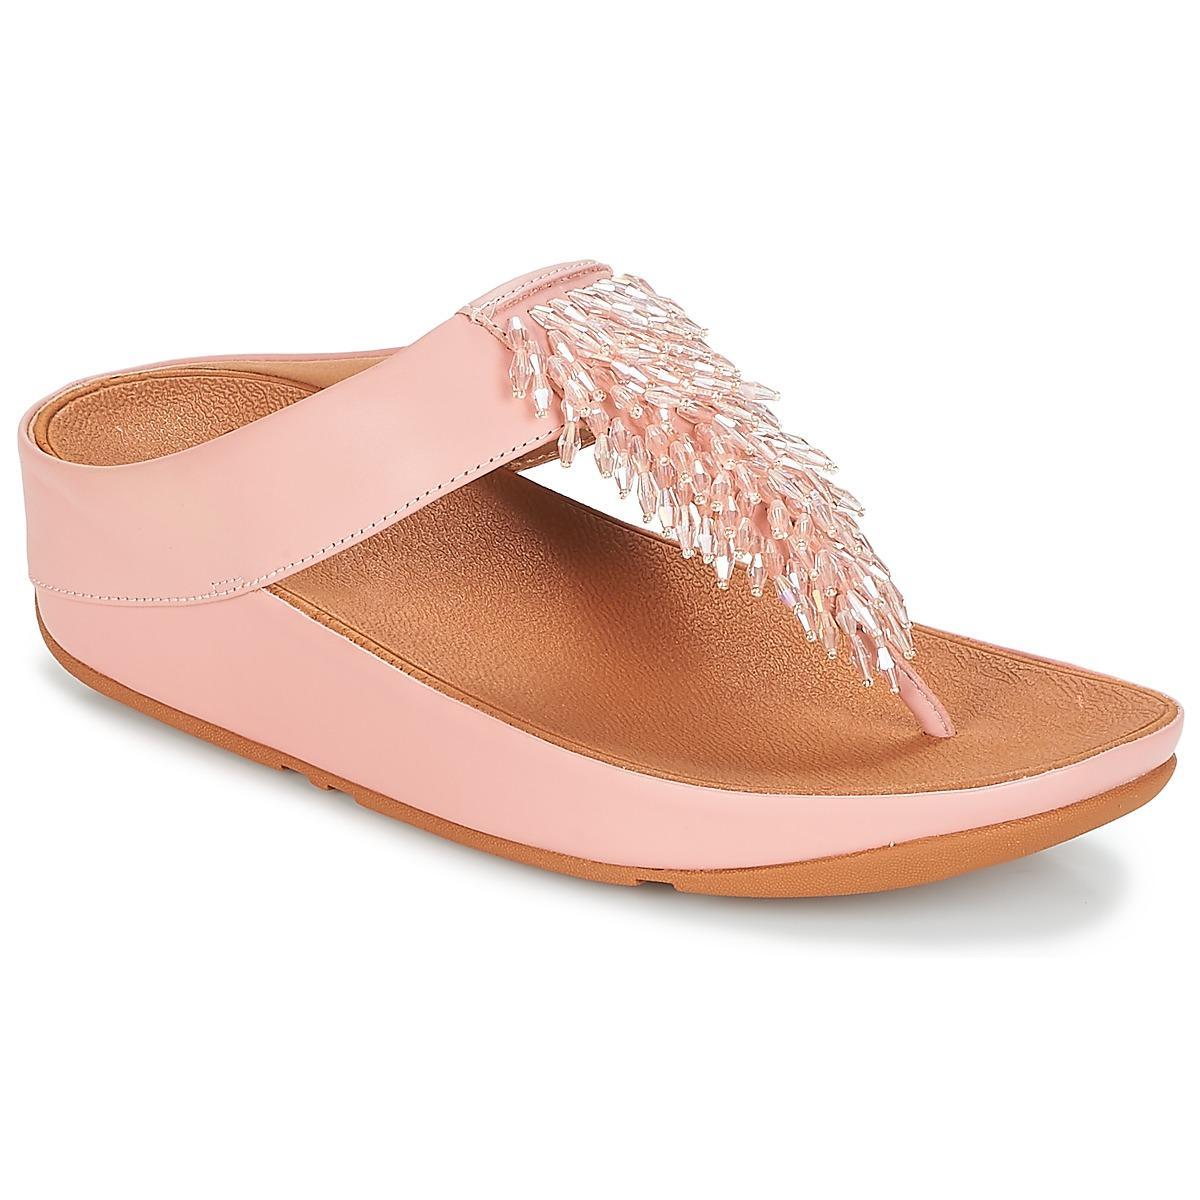 a4f4d1e656177 Fitflop Cha-cha Toe-thong Sandals Crystal Women s Flip Flops ...